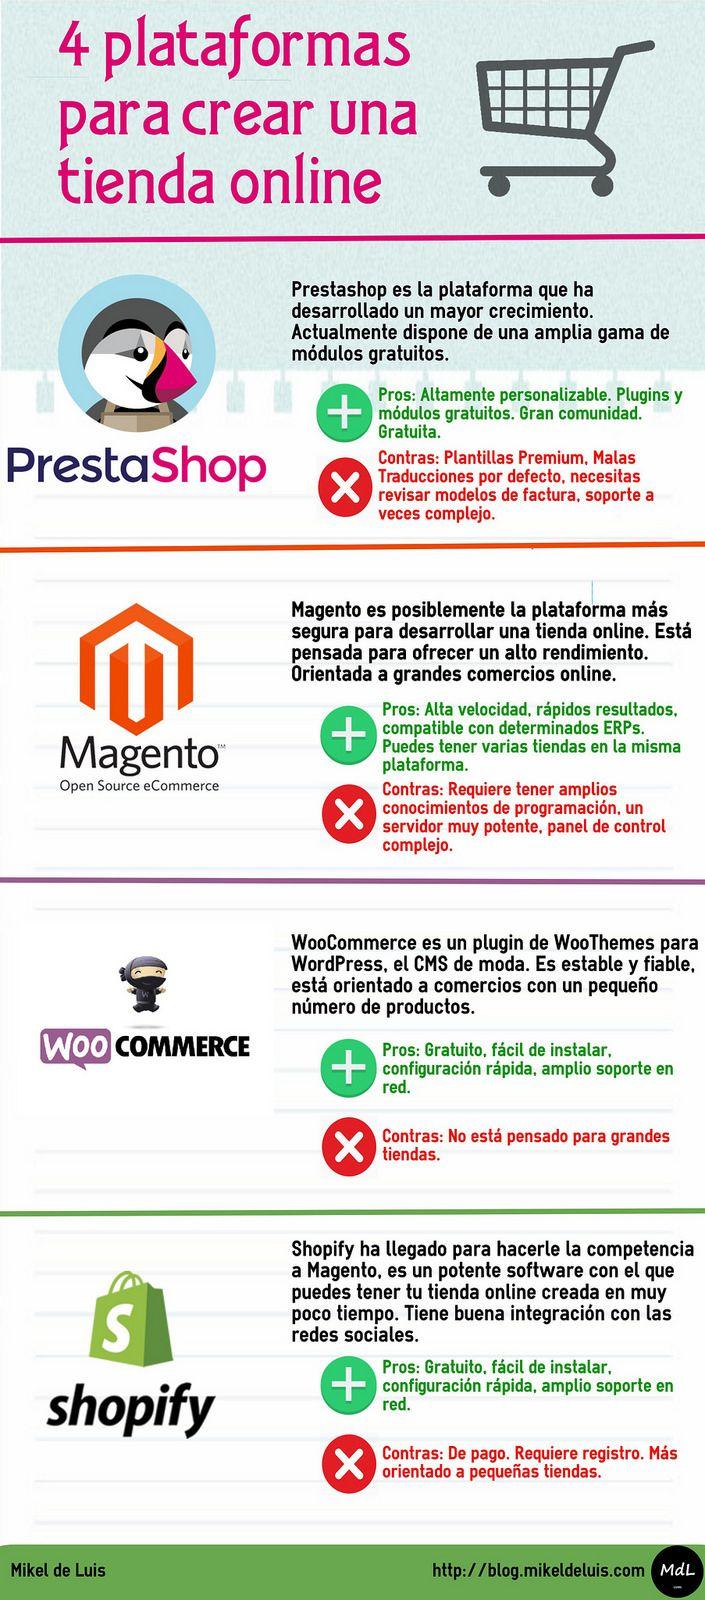 4 plataformas para montar una tienda Online [Infografía] - http://blog.mikeldeluis.com/2016/02/02/4-plataformas-para-montar-una-tienda-online-infografia/ #ecommerce #prestashop #magento #woocommerce #wordpress #shopify #eshop #onlinecommerce #webshop #infografia